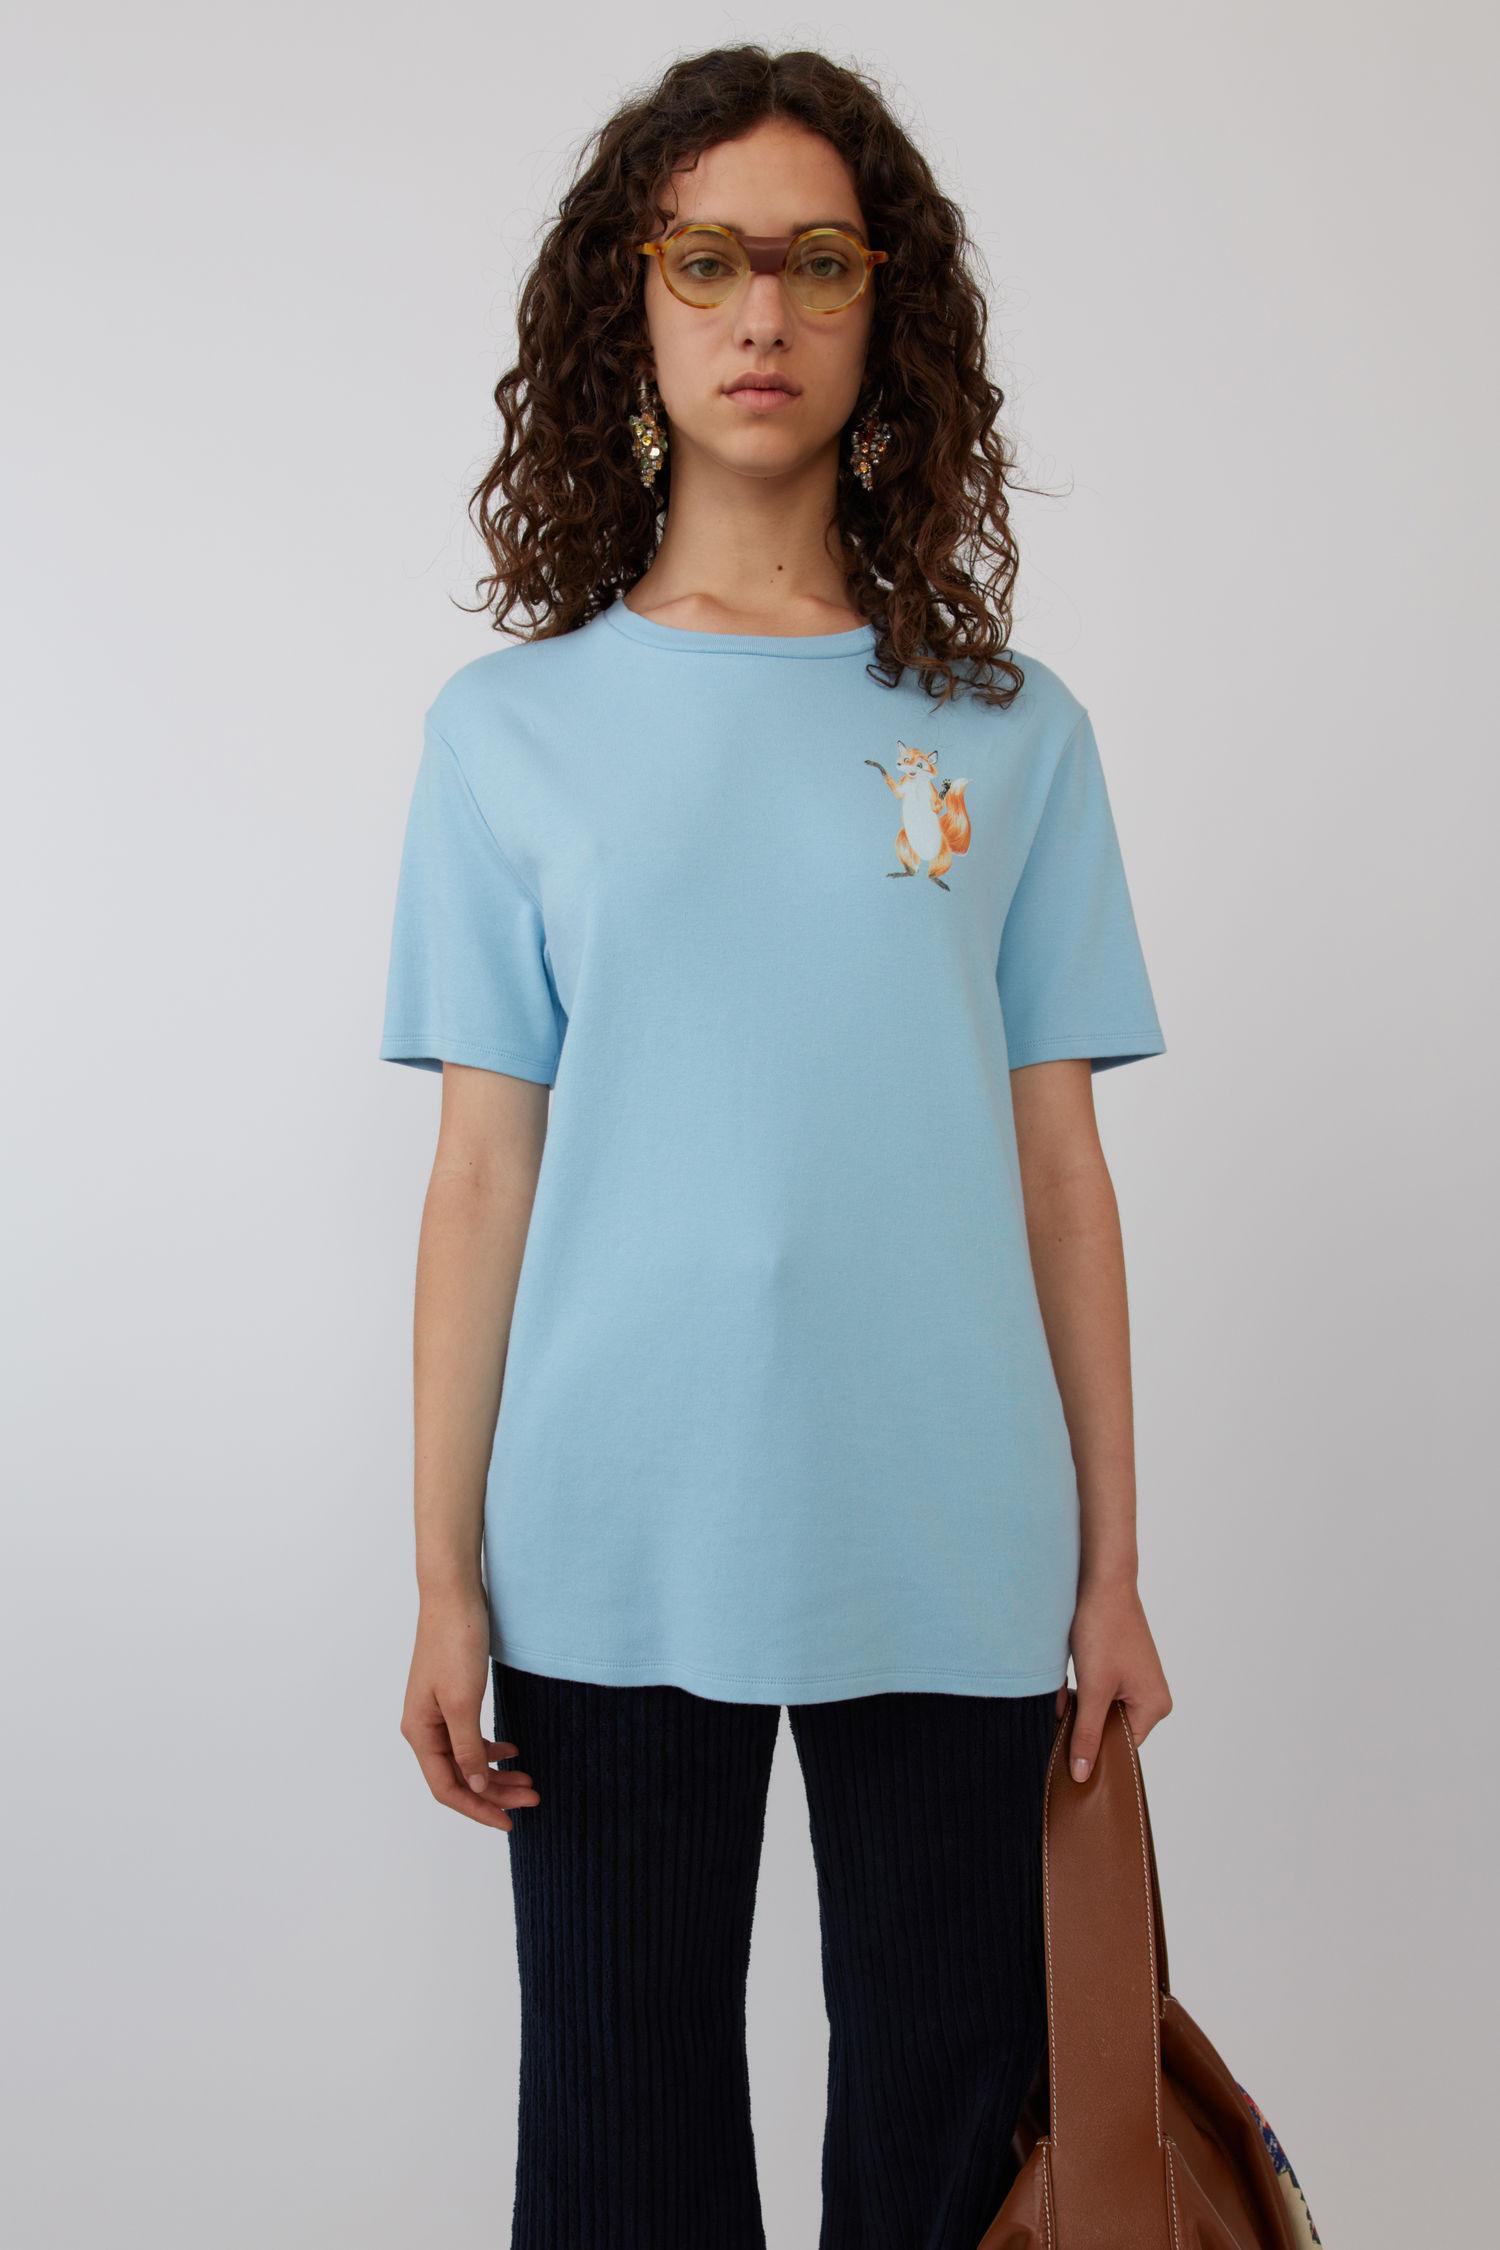 ACNE STUDIOS Fox Print T-Shirt Pale Blue